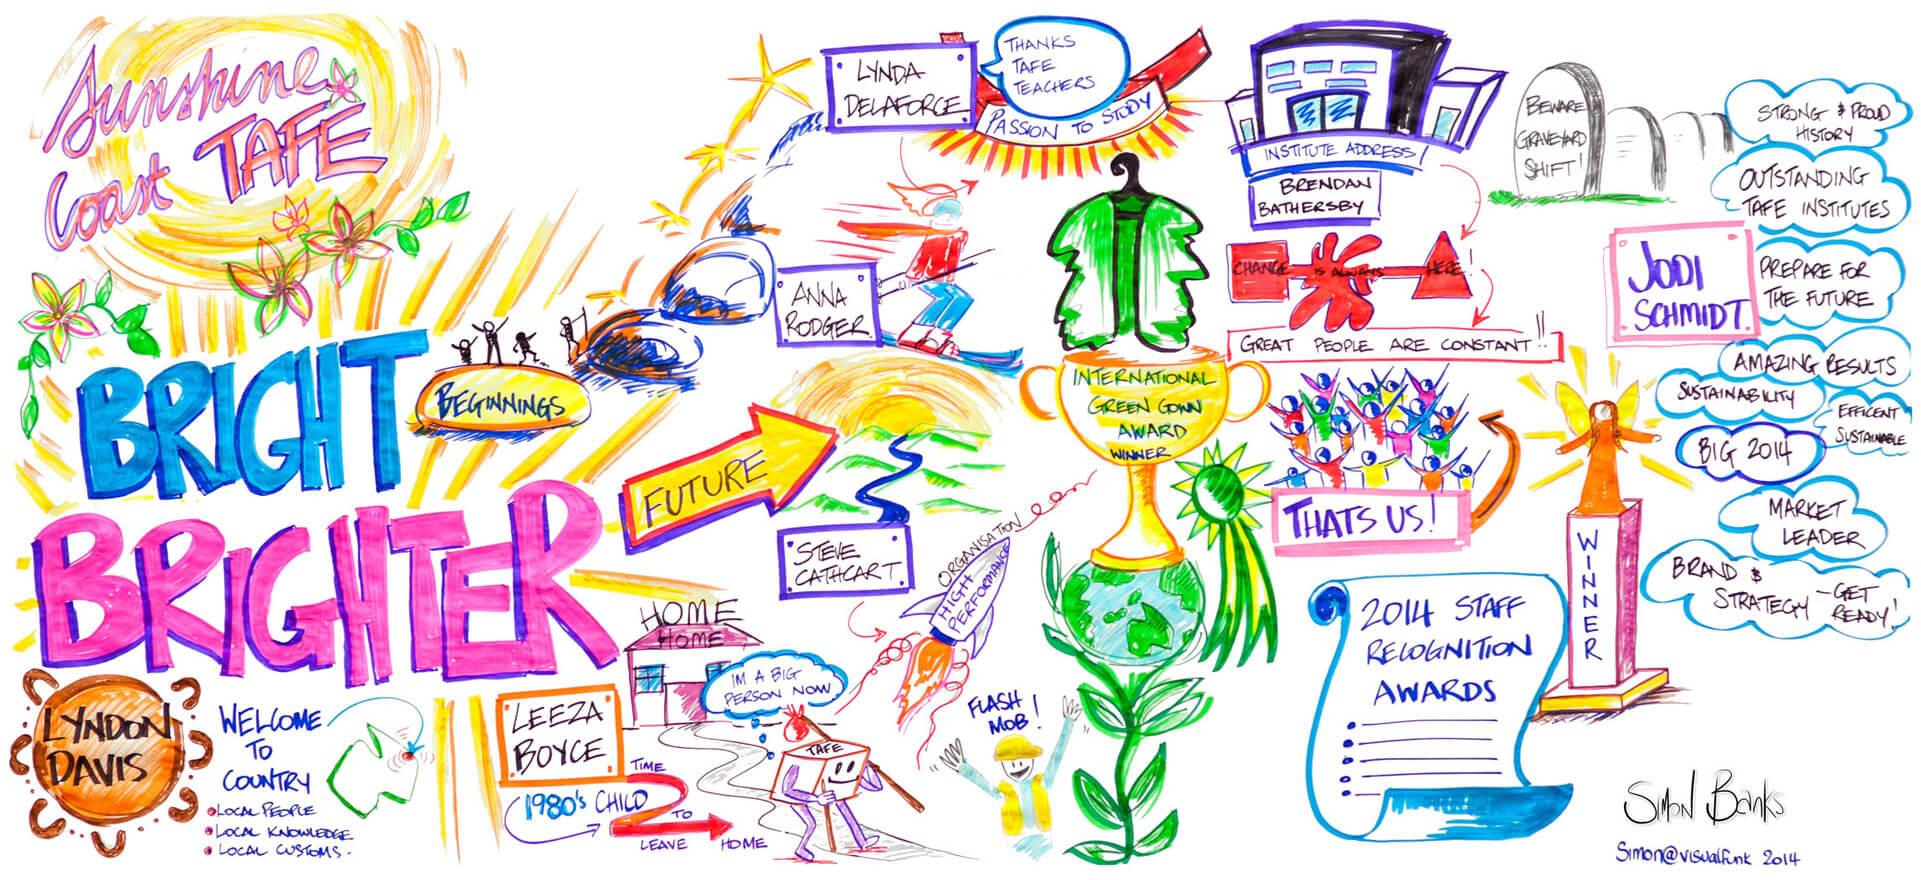 Simon Banks Event MC and Illustration TAFE QLD 2014